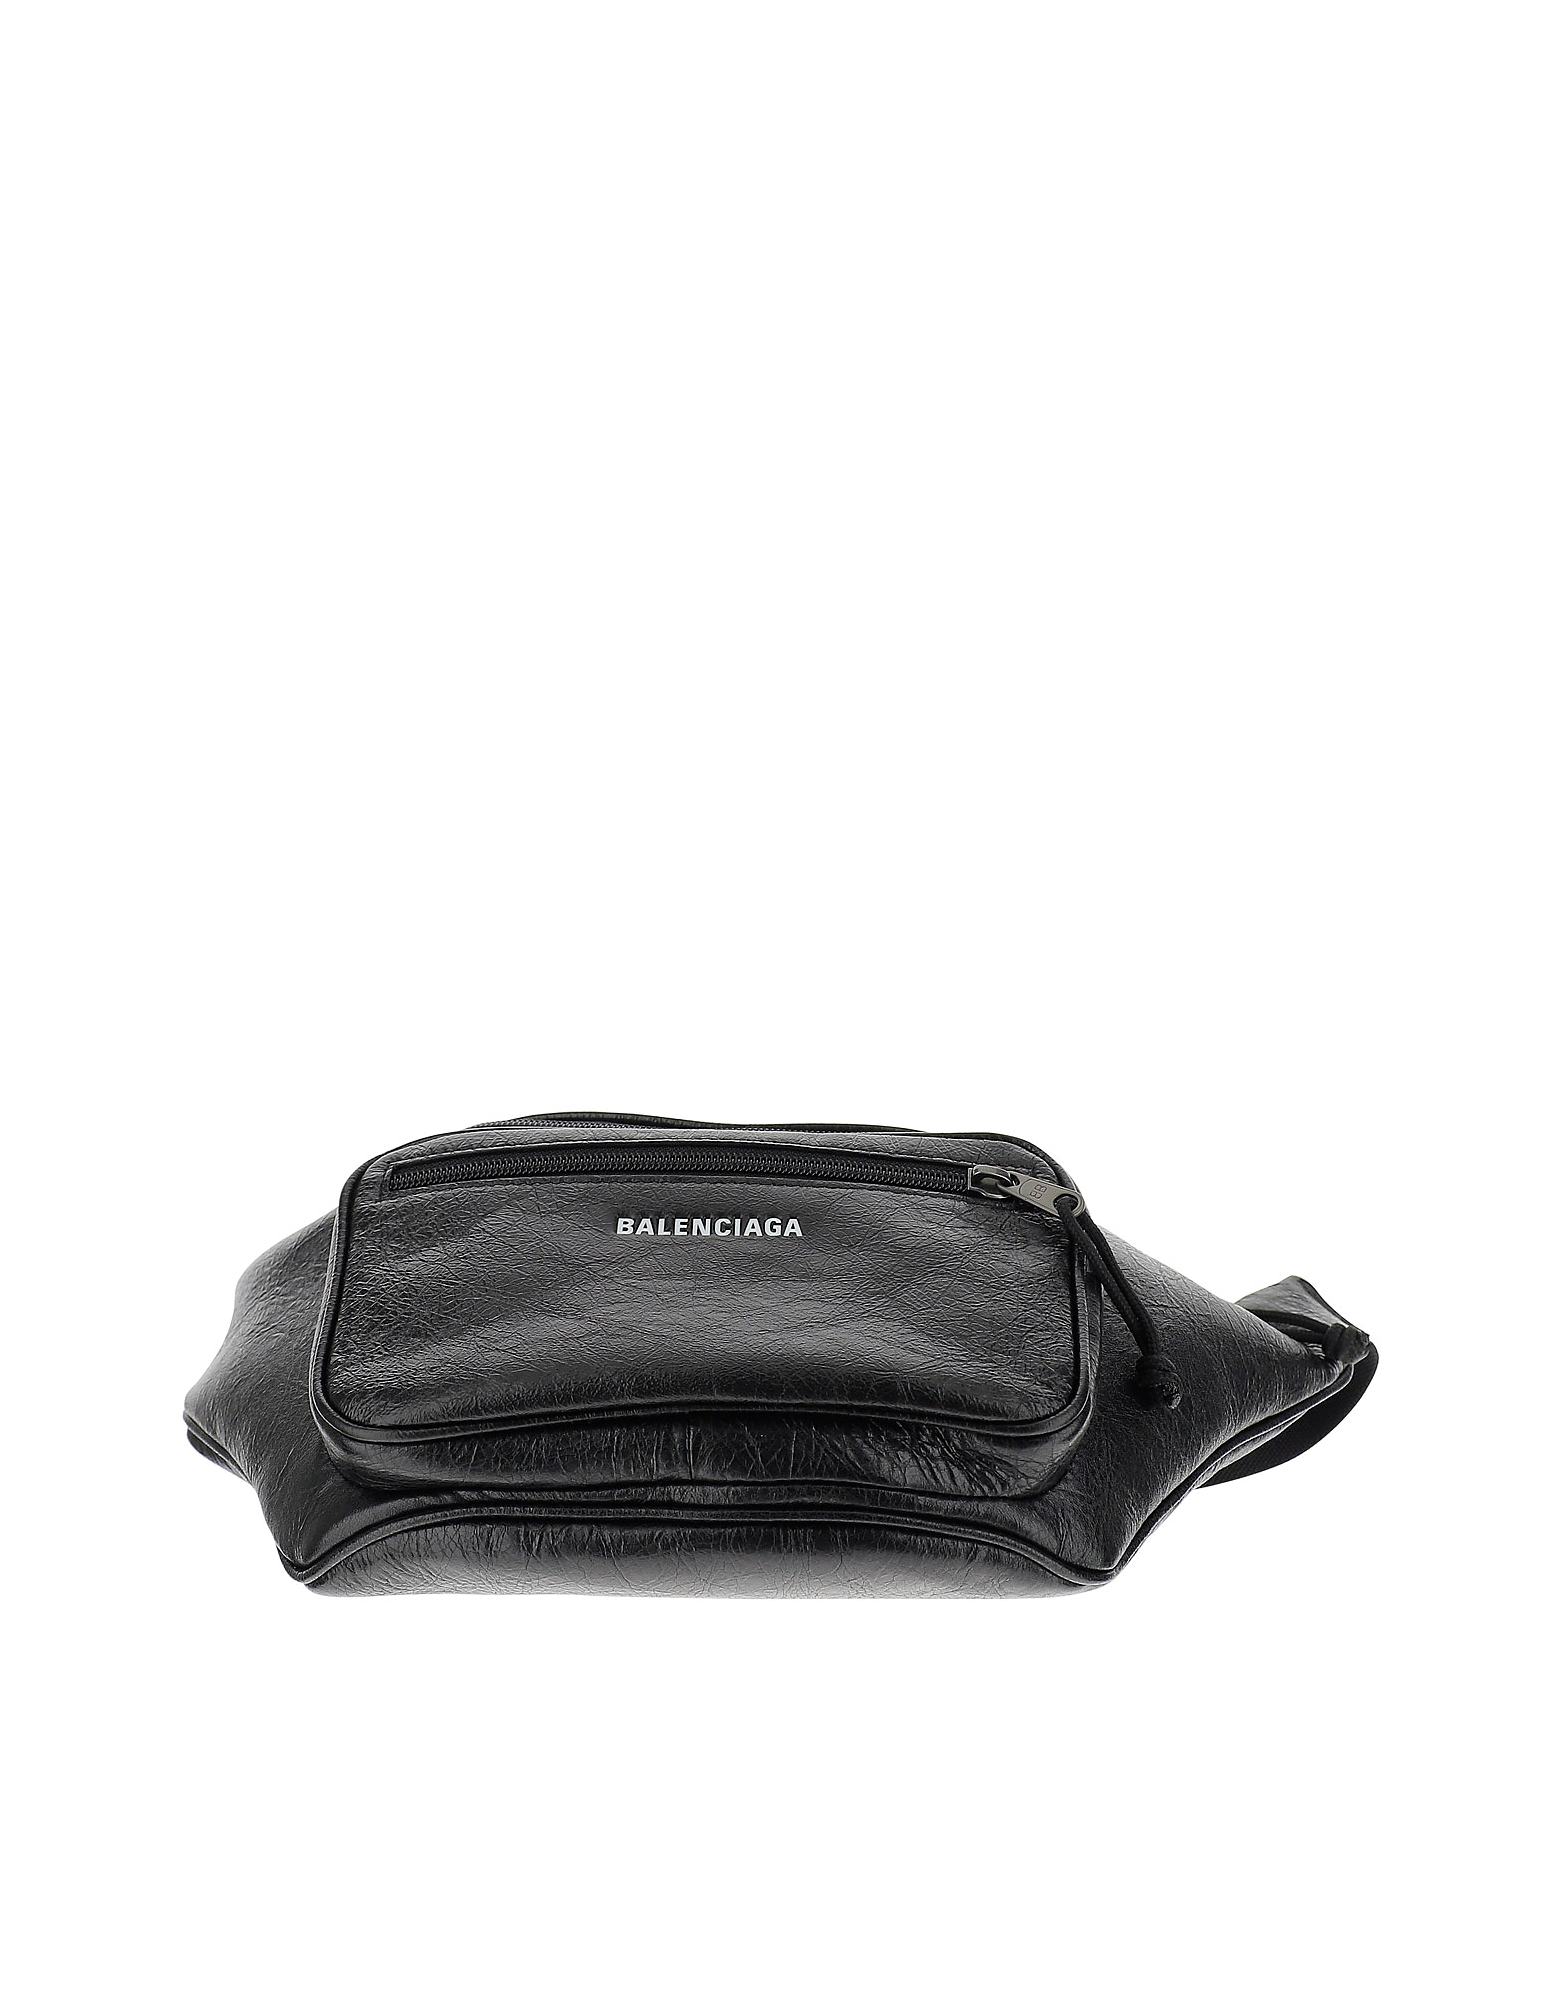 Balenciaga Designer Men's Bags, Black Leather Belt Bag